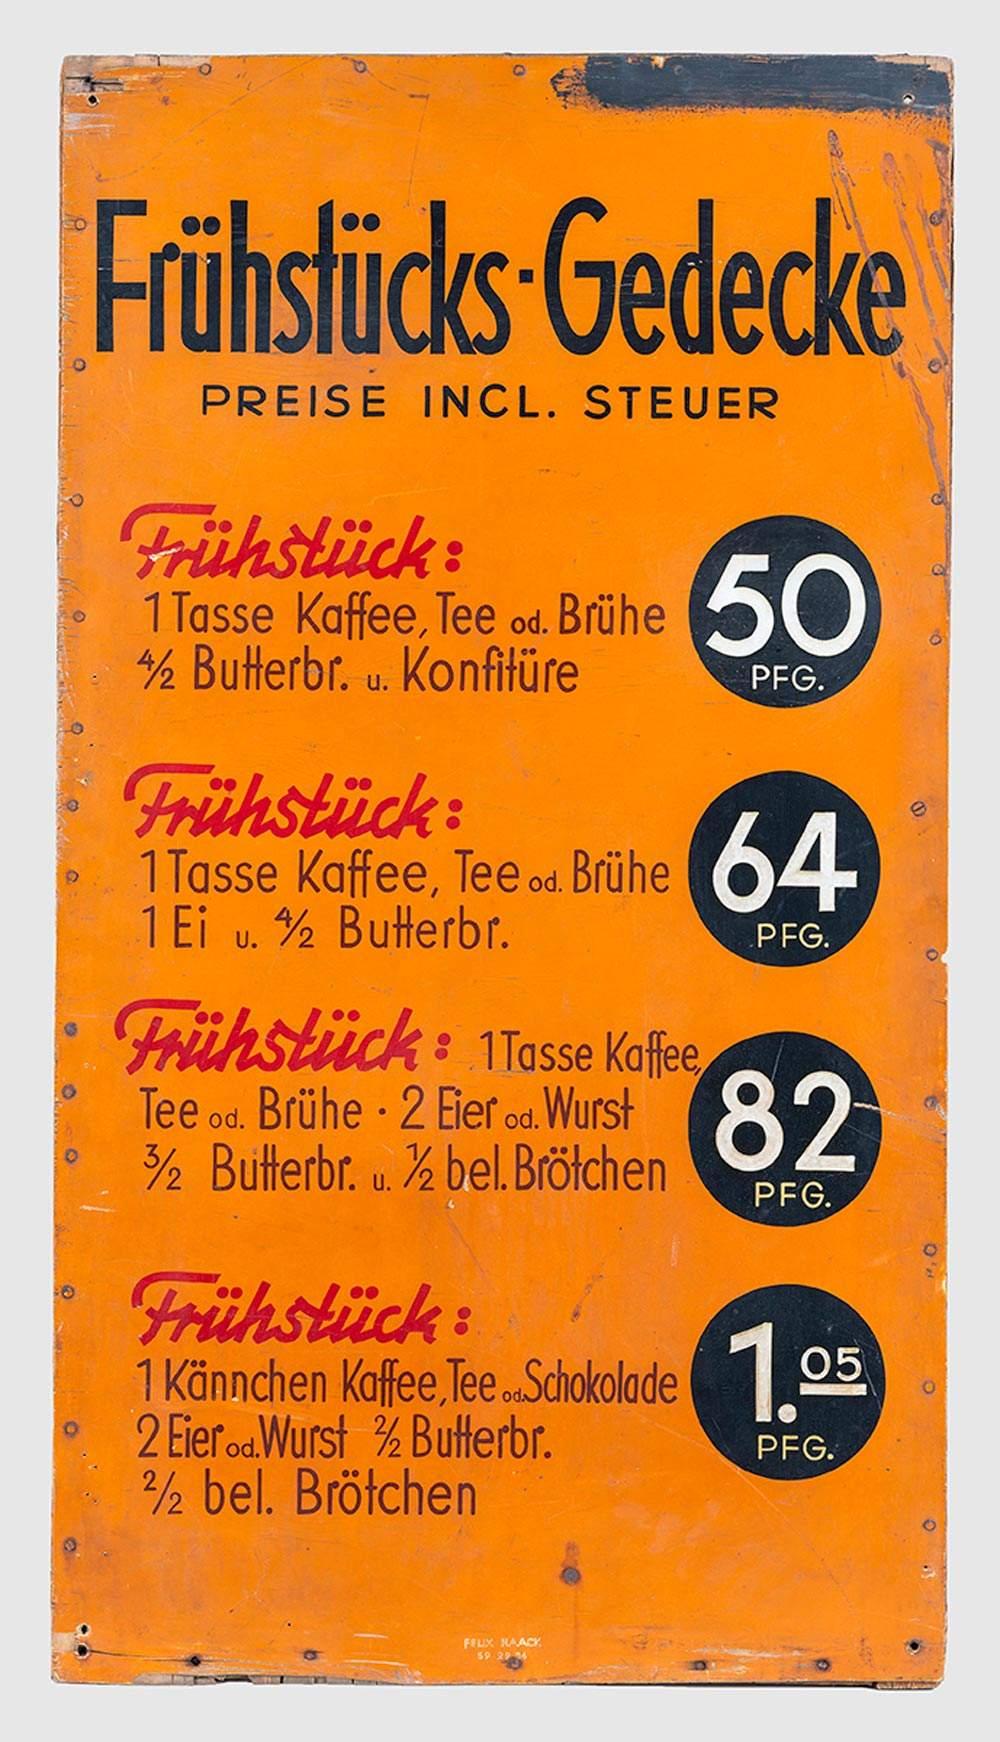 werbeaufsteller cafe regensburg berlin